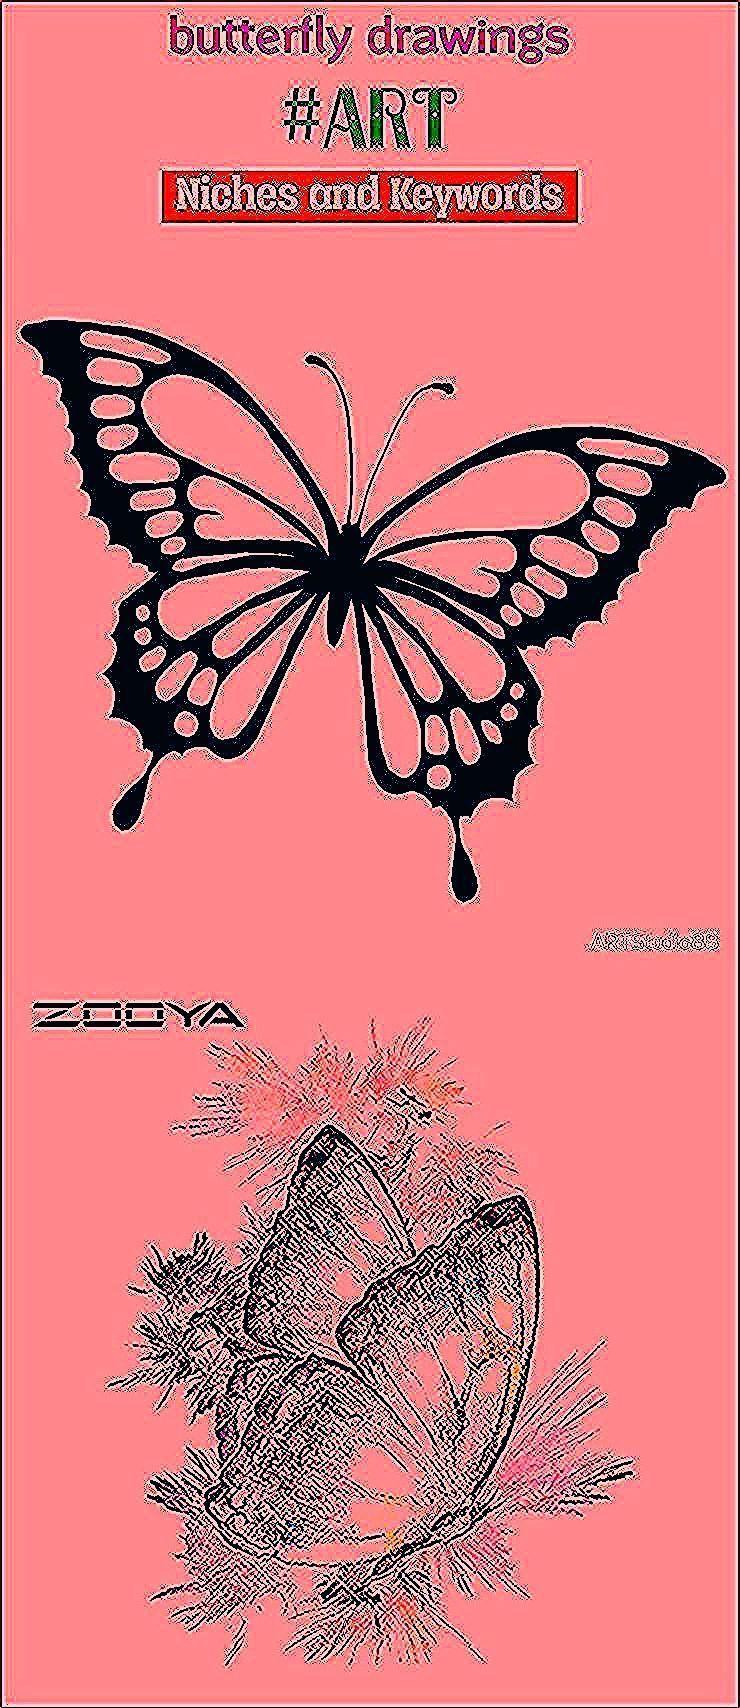 Butterfly Drawings Art Seo2020 Trending Drawings Easy Drawings Ideas Pencil Drawings Drawings Sketches In 2020 Butterfly Drawing Pencil Drawings Easy Drawings